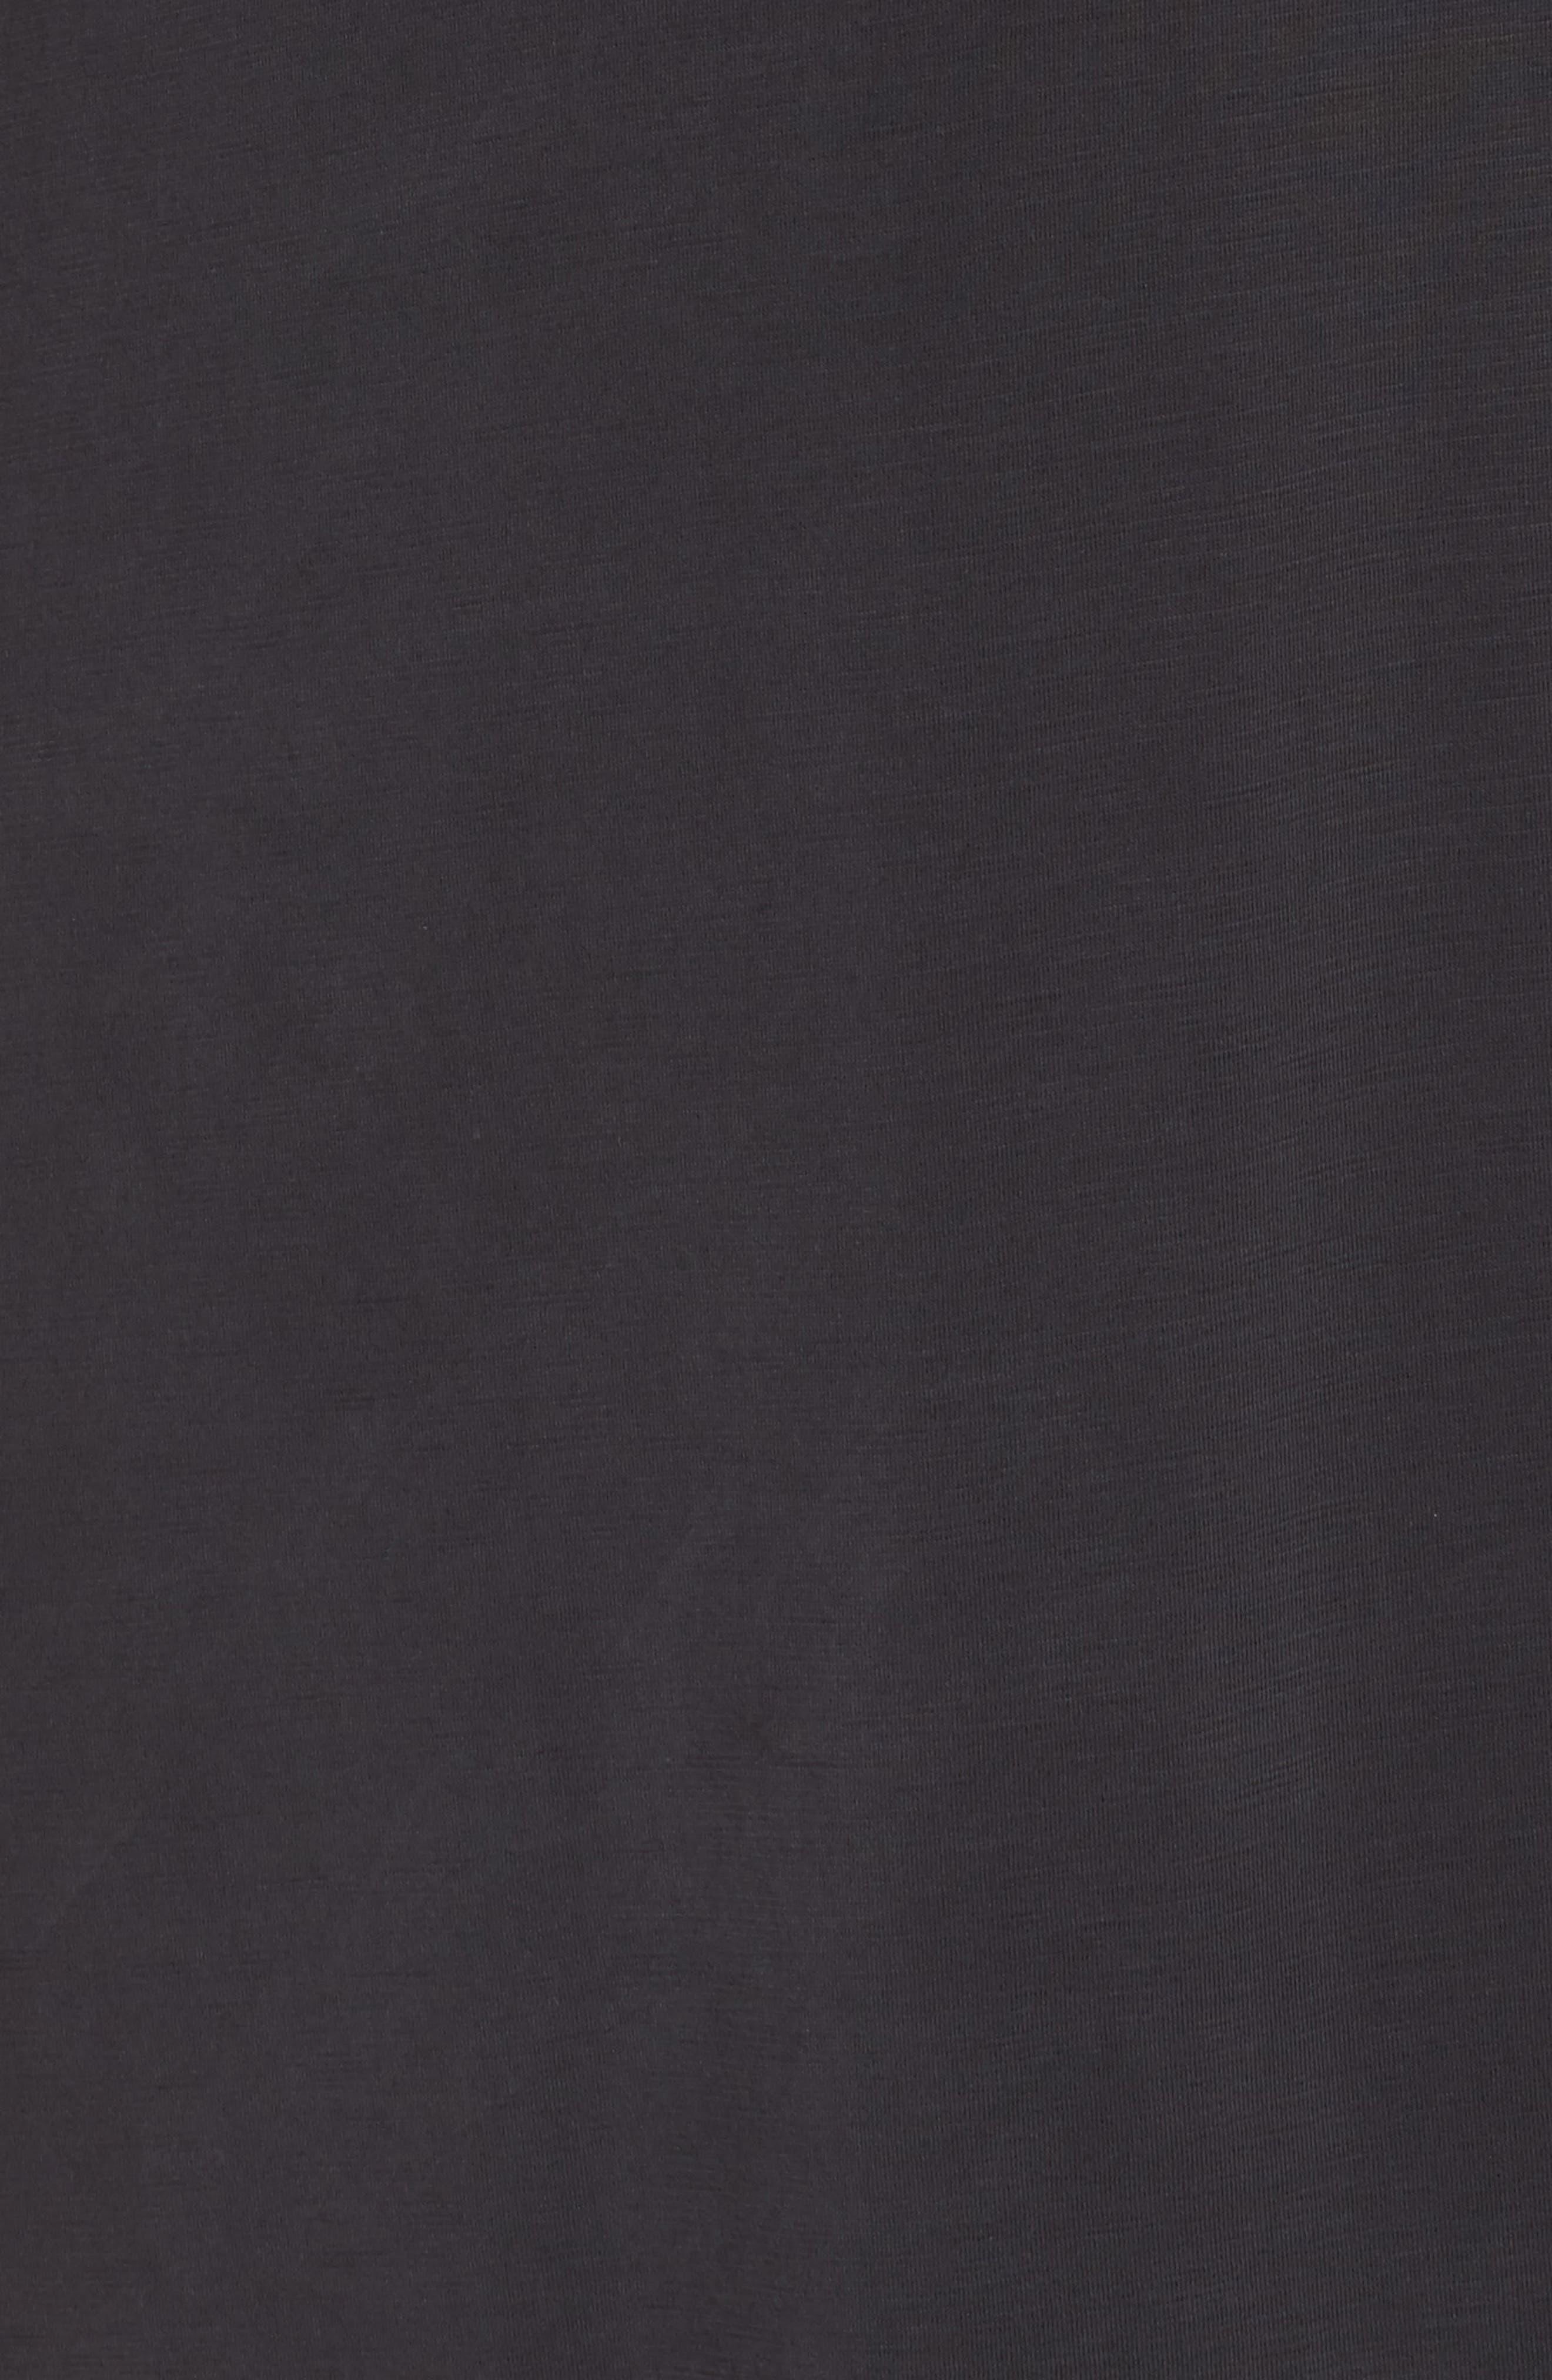 Boardwalk Jersey High/Low Dress,                             Alternate thumbnail 5, color,                             Washed Black